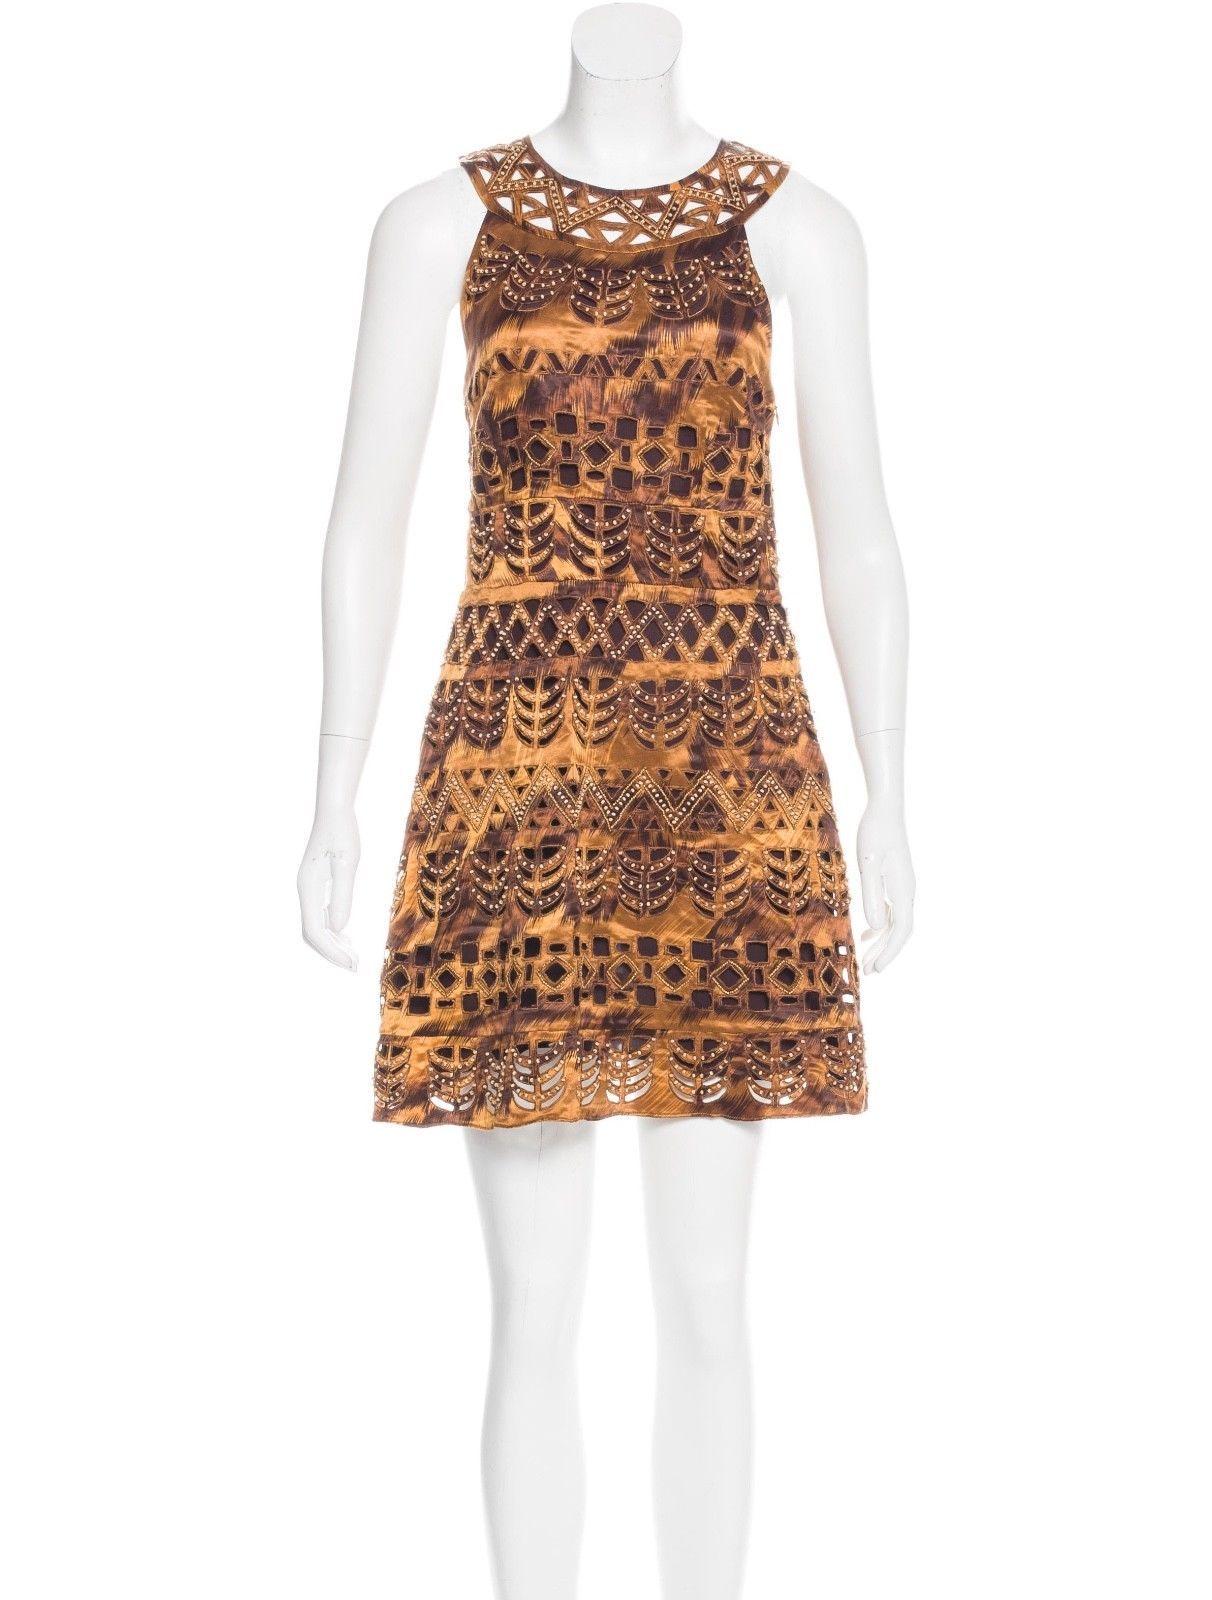 DVF Diane von Furstenberg Asuka Silk Shift Dress Brown Beaded sz 2 - $58.90